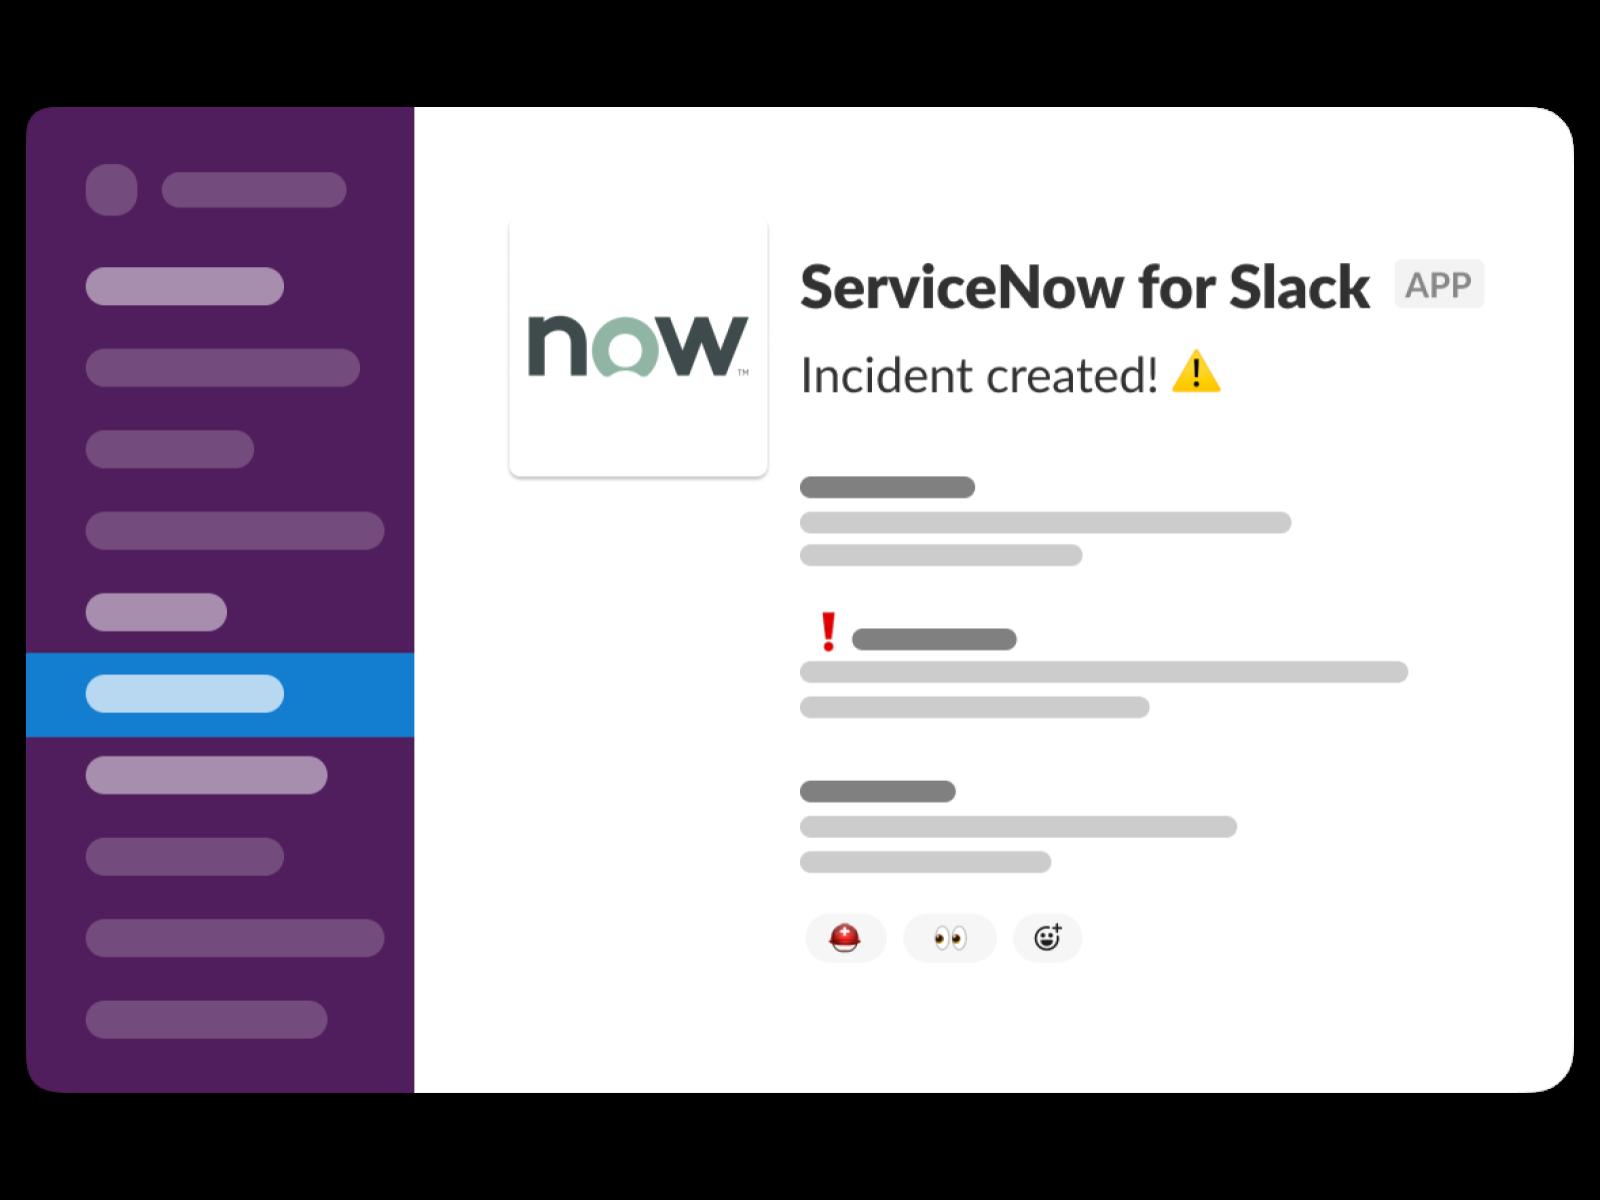 ServiceNow for Slack App